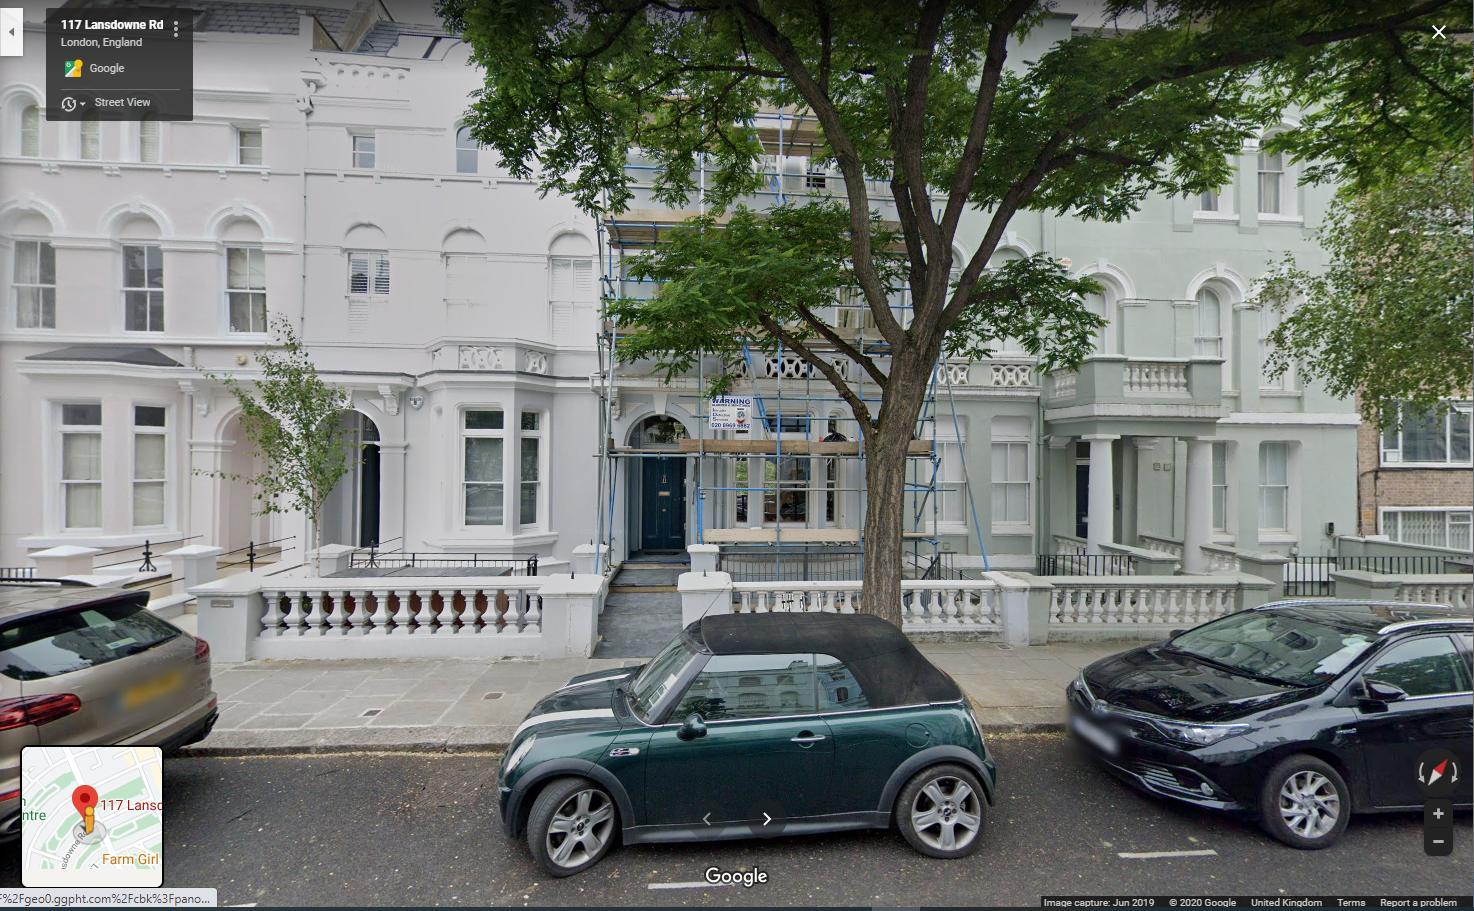 117, Lansdowne Road, Notting Hill, London, W11 2LF